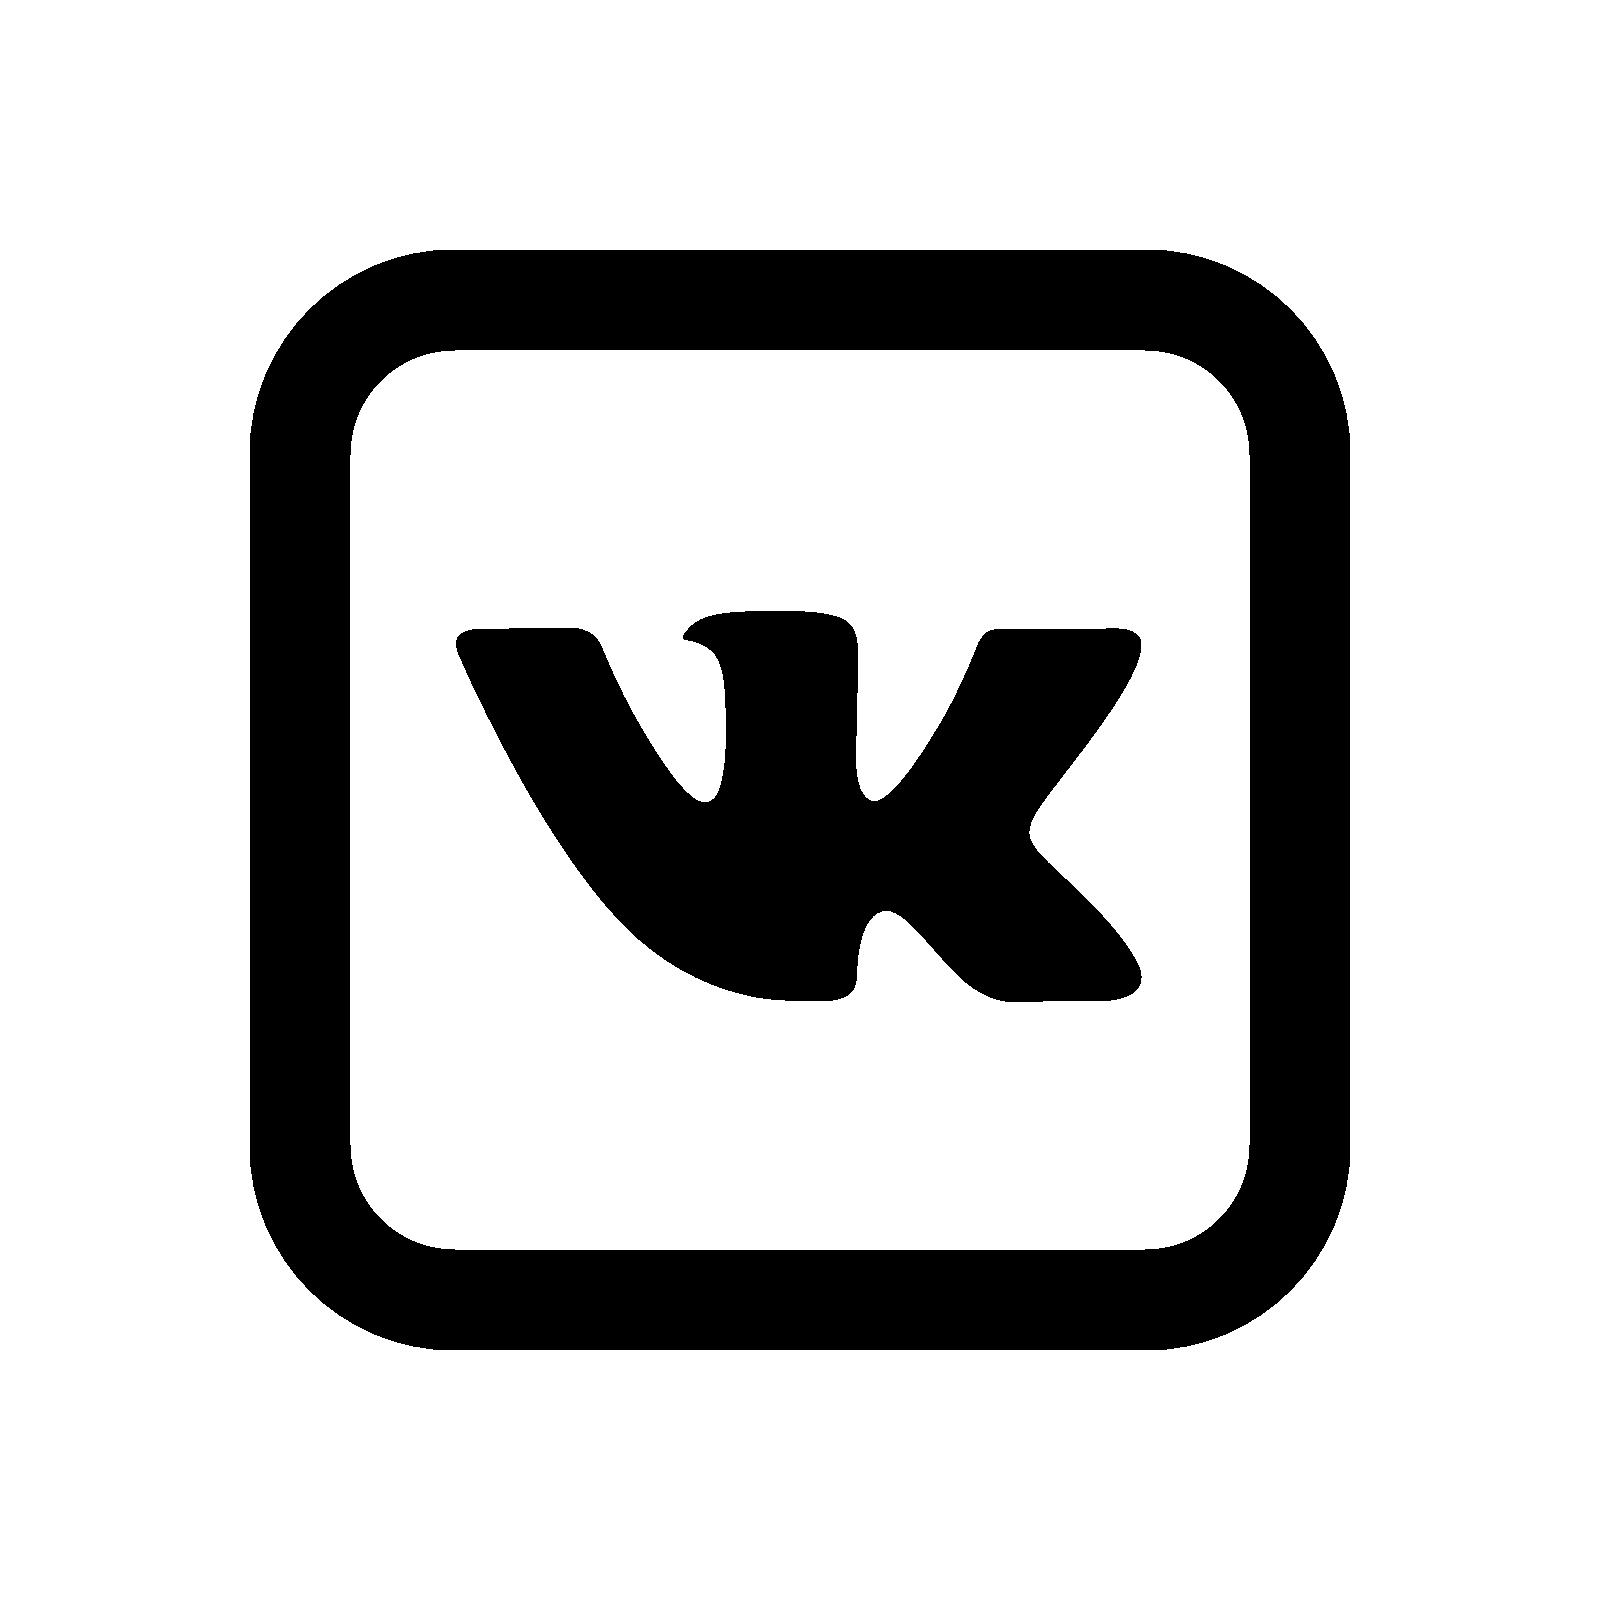 Значки секс для вконтакте